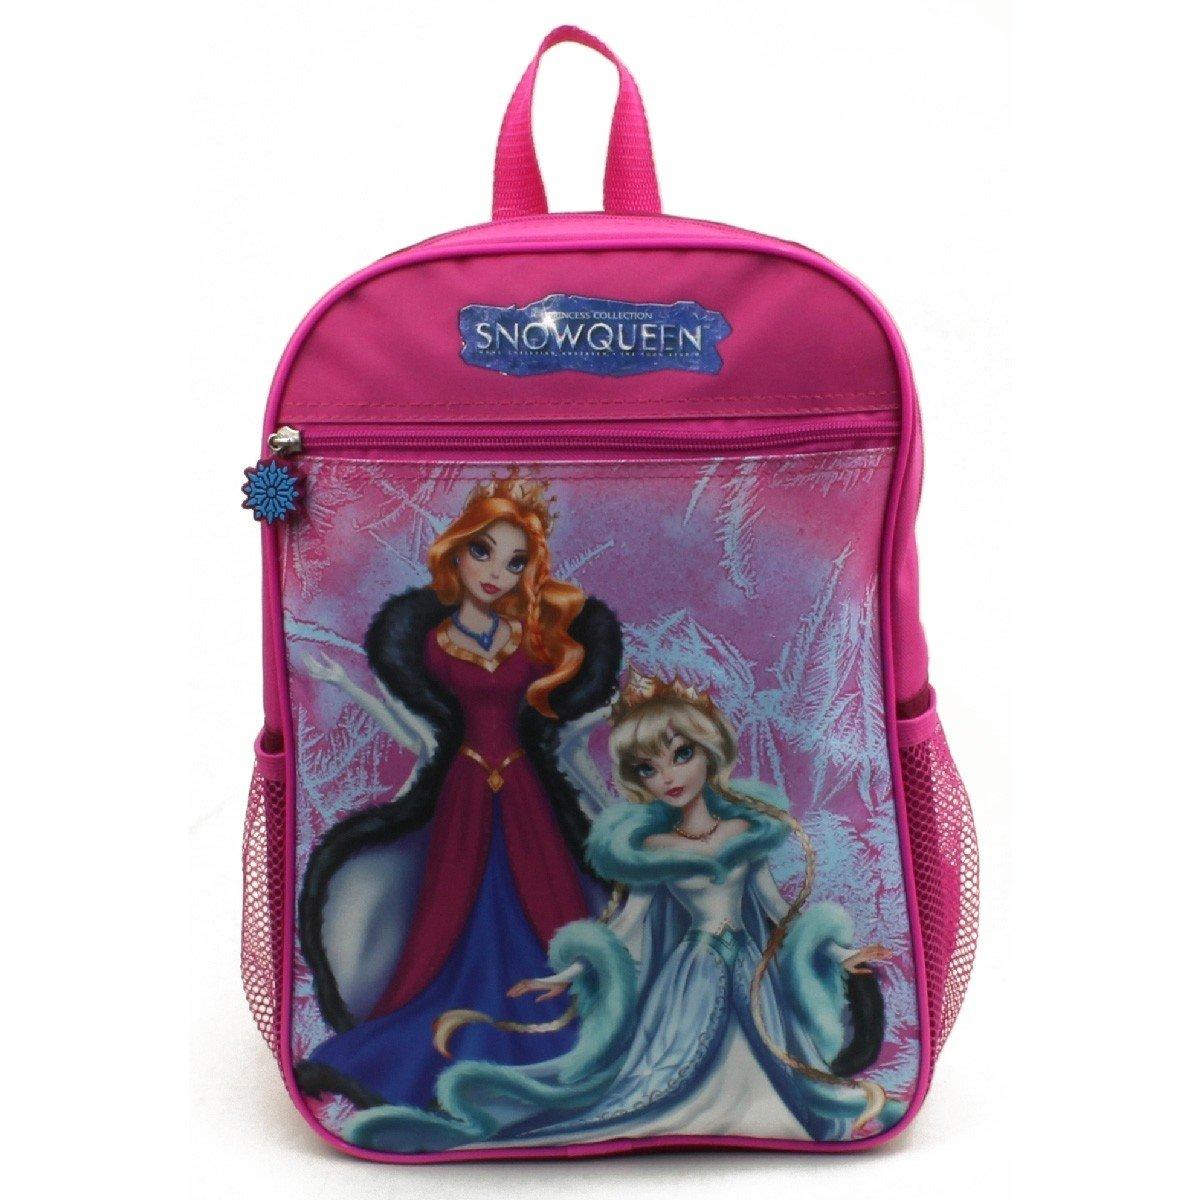 15'' Wholesale Junior Elf Princess Backpacks - Case of 24